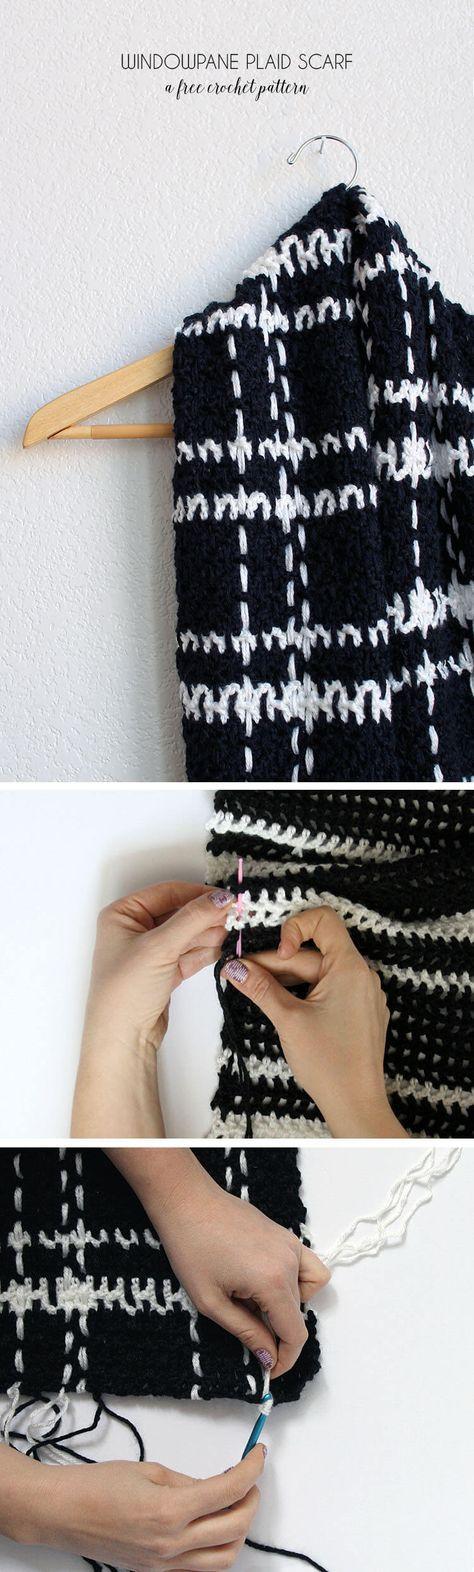 Windowpane Plaid Scarf - Free Crochet Pattern